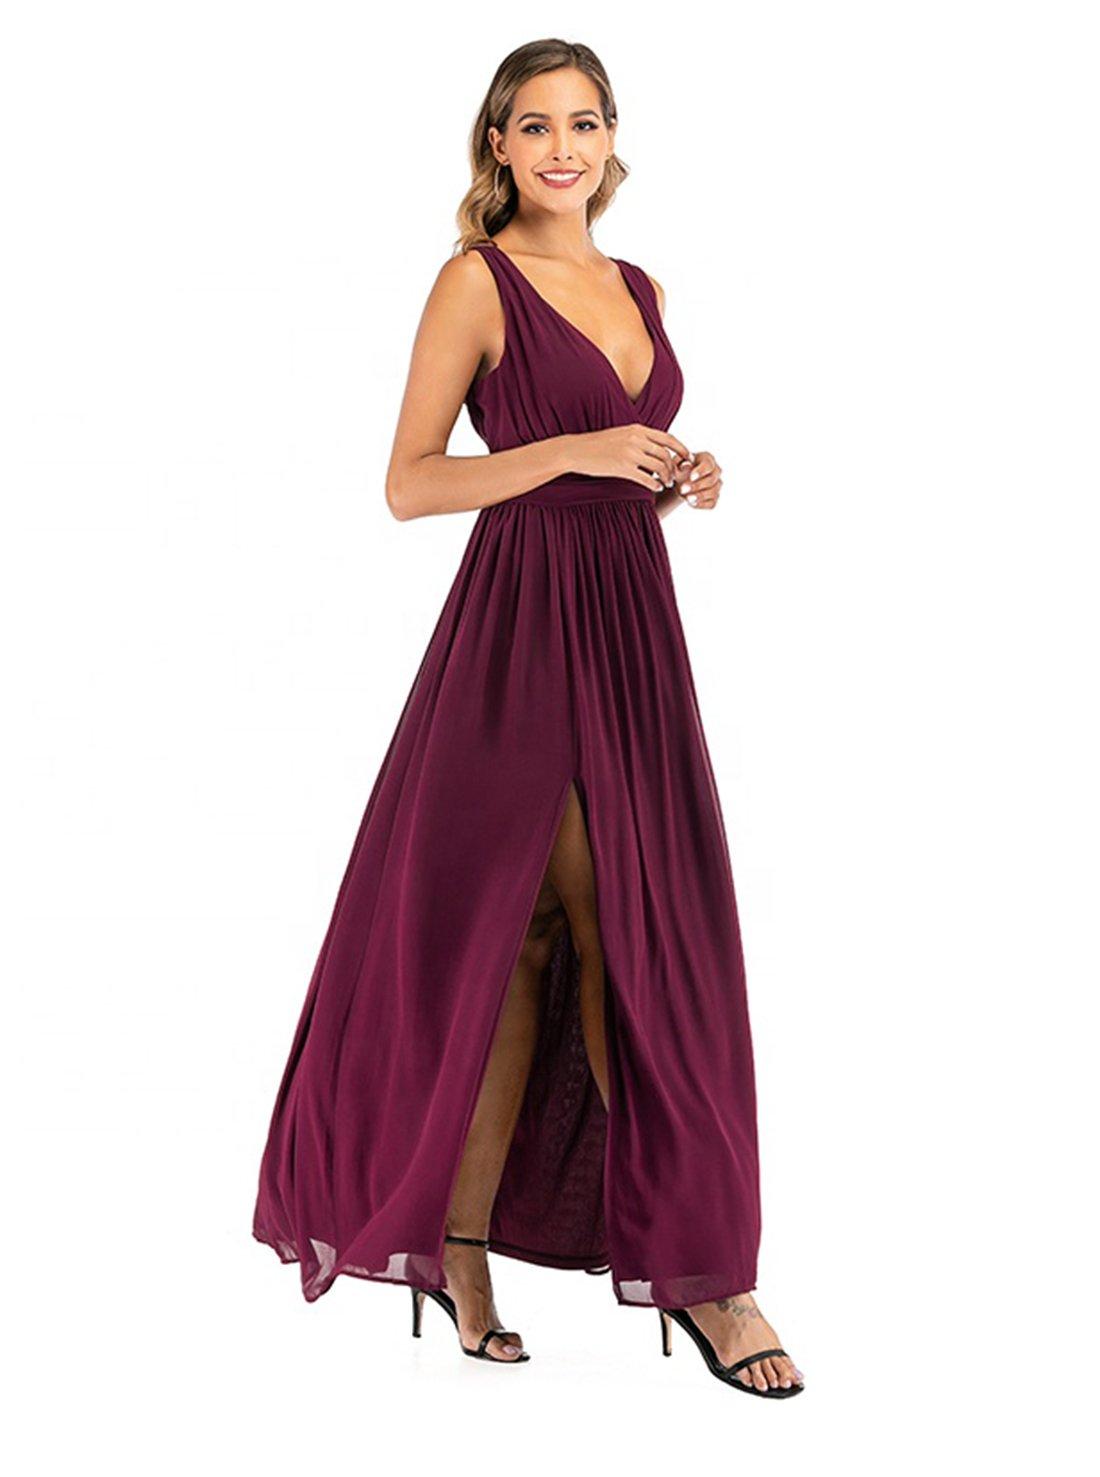 V Neck A-line Homecoming Cocktail Dress